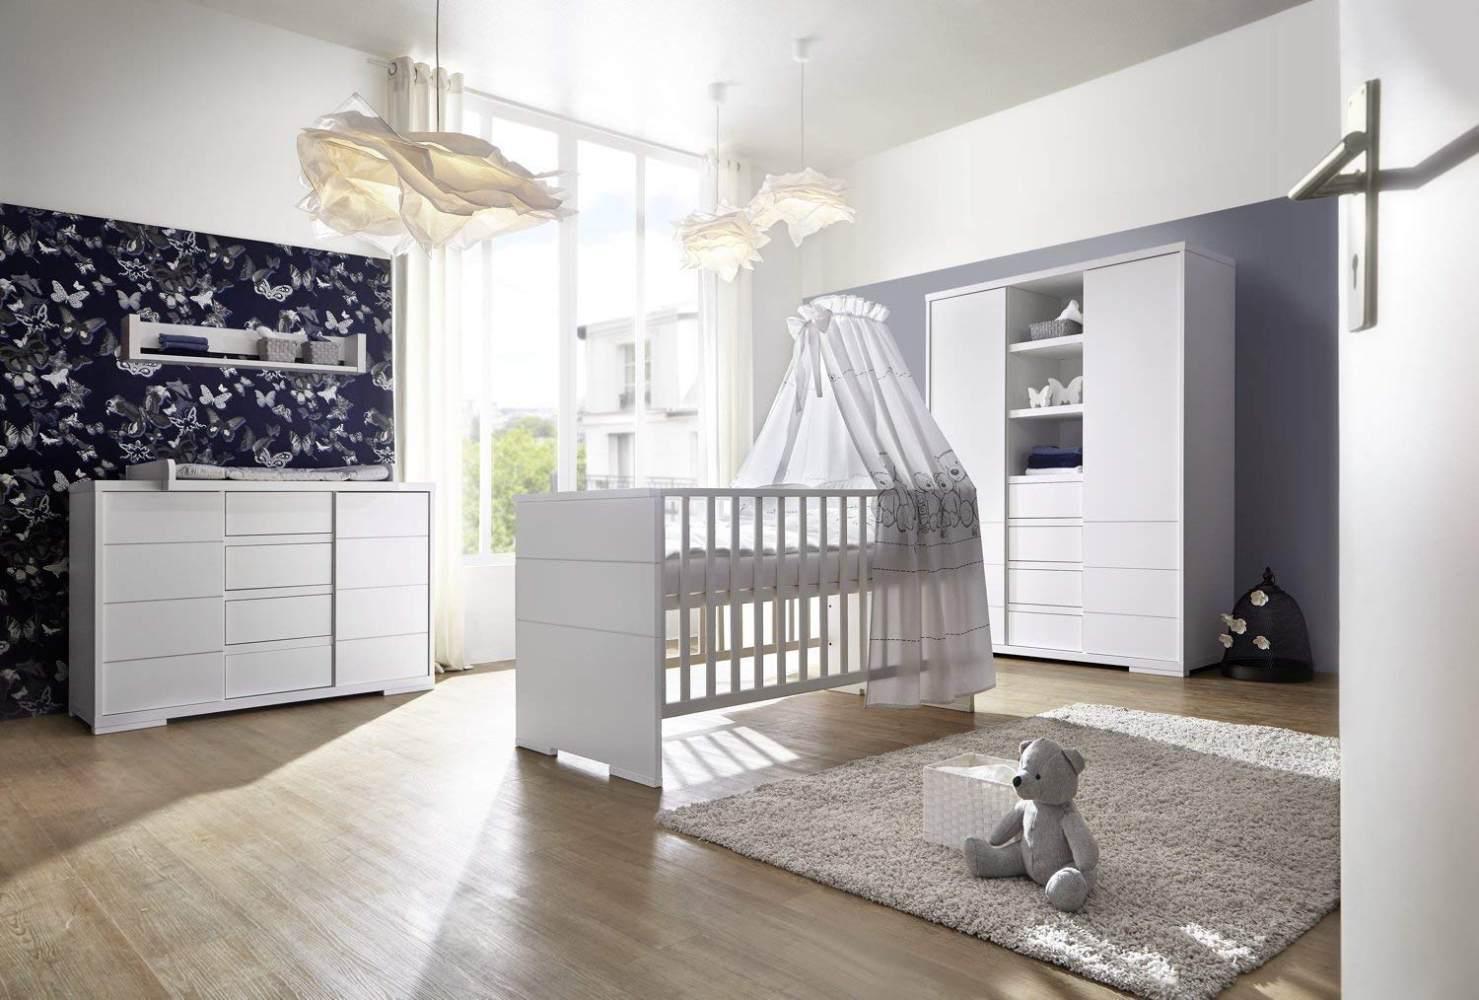 Schardt 'Maxx White' 3-tlg. Babyzimmer-Set Bild 1